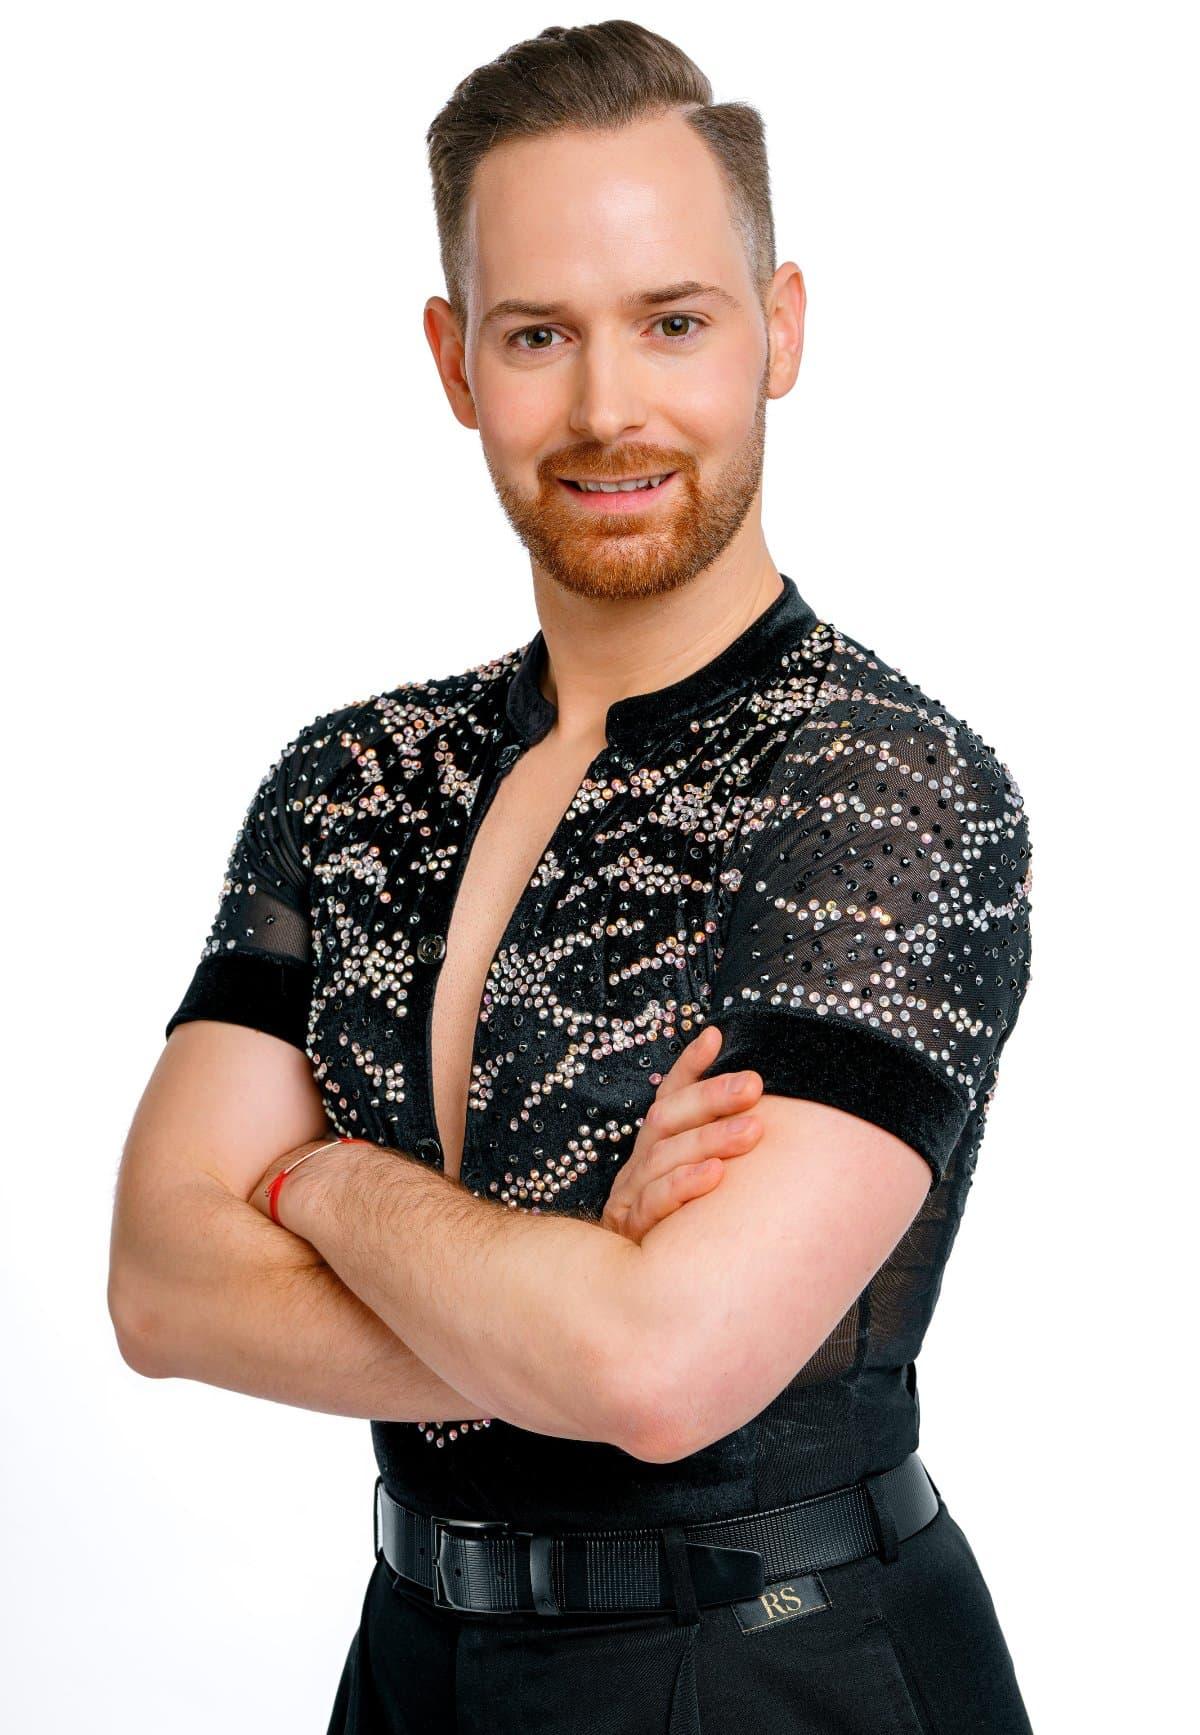 Florian Vana - Profitänzer bei den Dancing Stars 2019